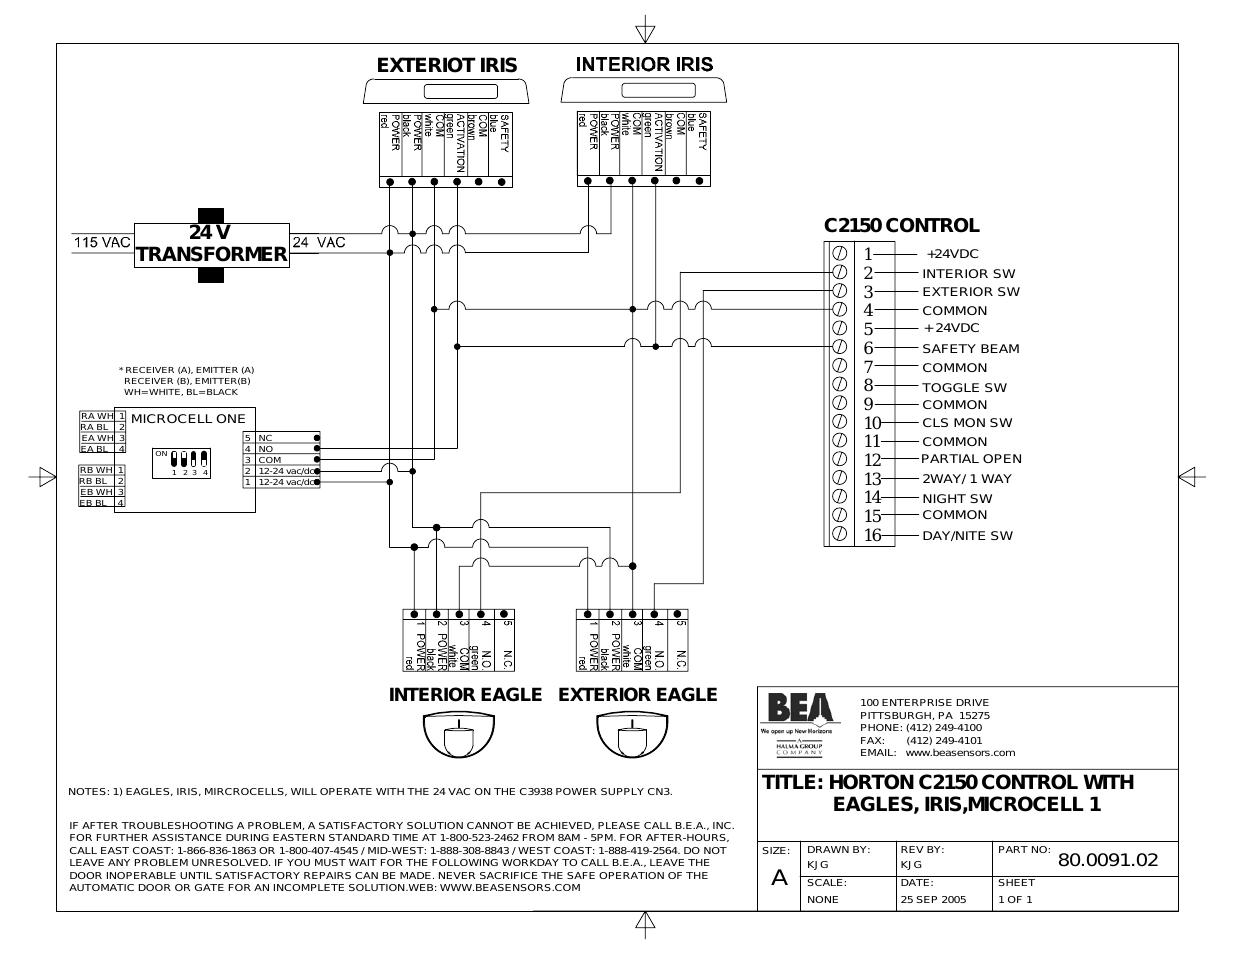 Bea Maglock Wiring Diagram - 2010 Jeep Liberty Fuse Box Diagram -  astrany-honda.yenpancane.jeanjaures37.fr | Bea Maglock Wiring Diagram |  | Wiring Diagram Resource